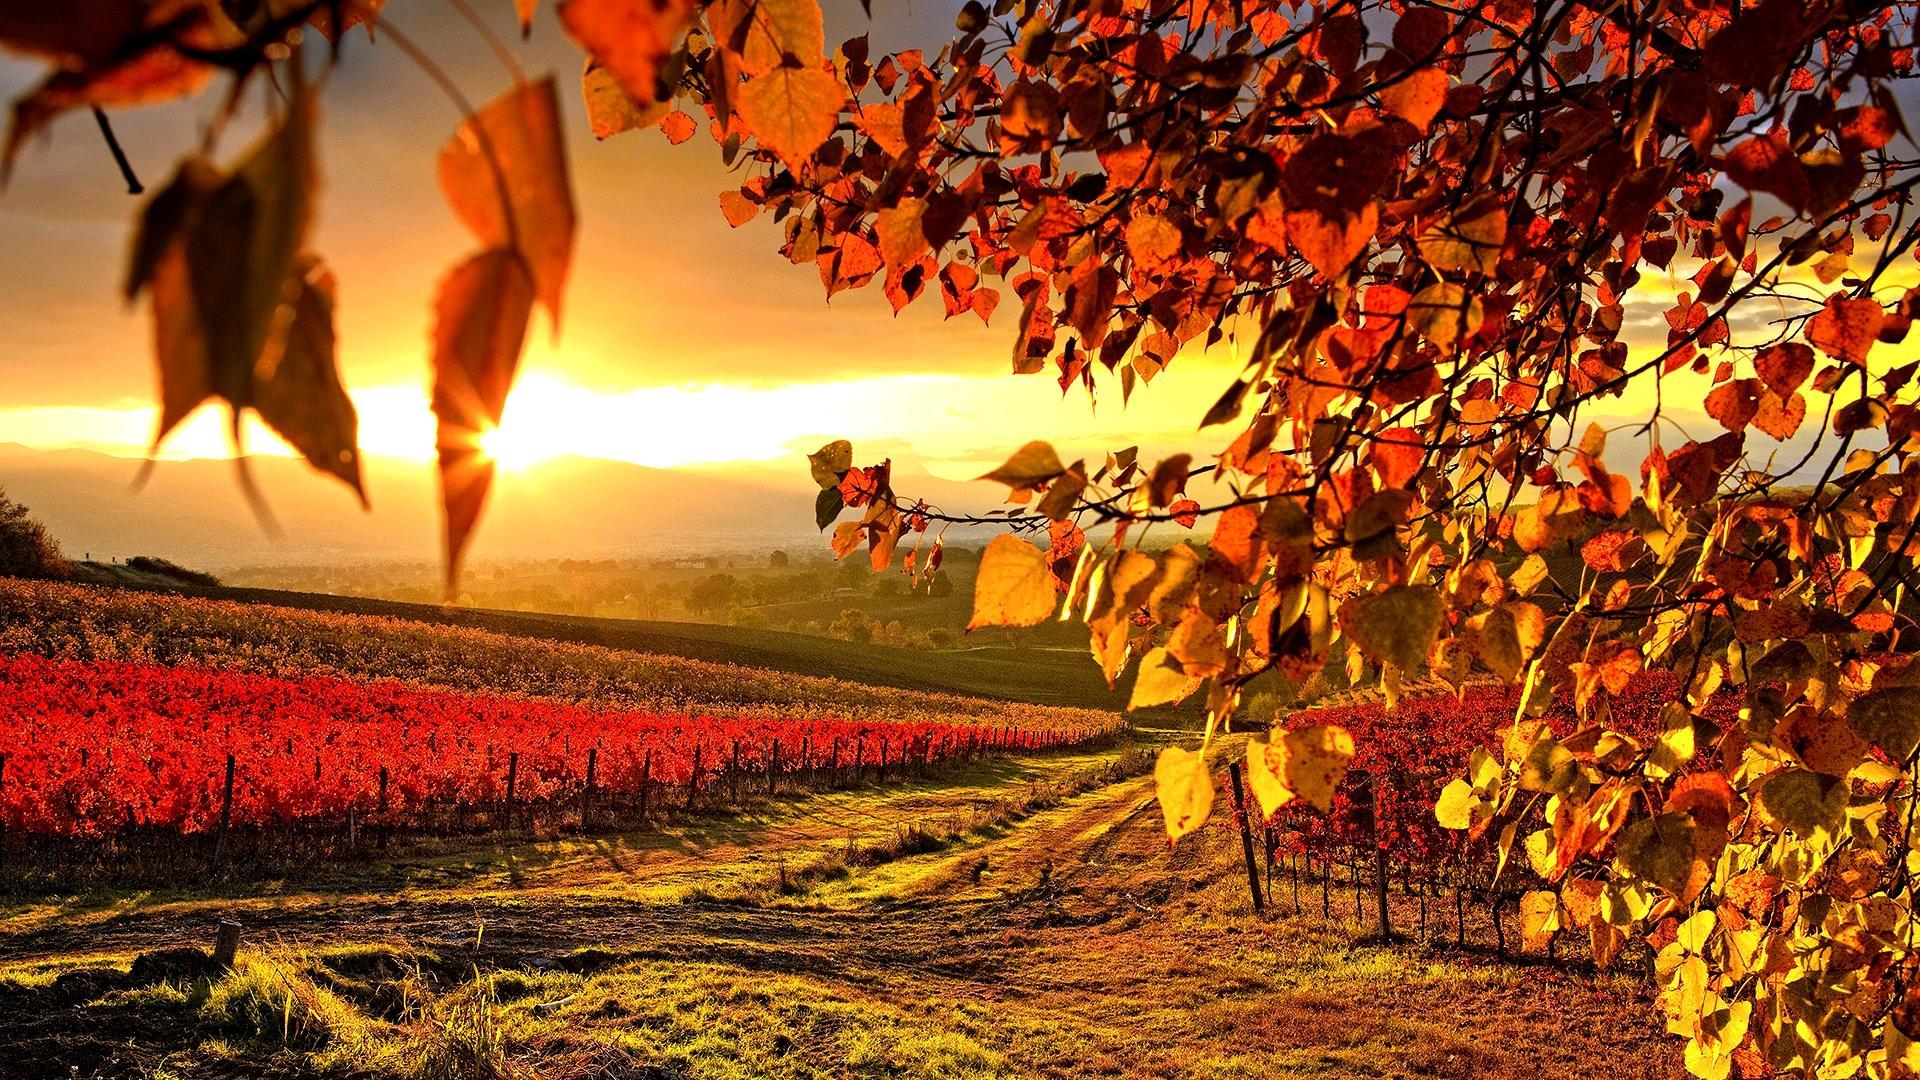 Beautiful Vineyard Autumn Wallpaper Full HD Wallpaper with 1920x1080 1920x1080